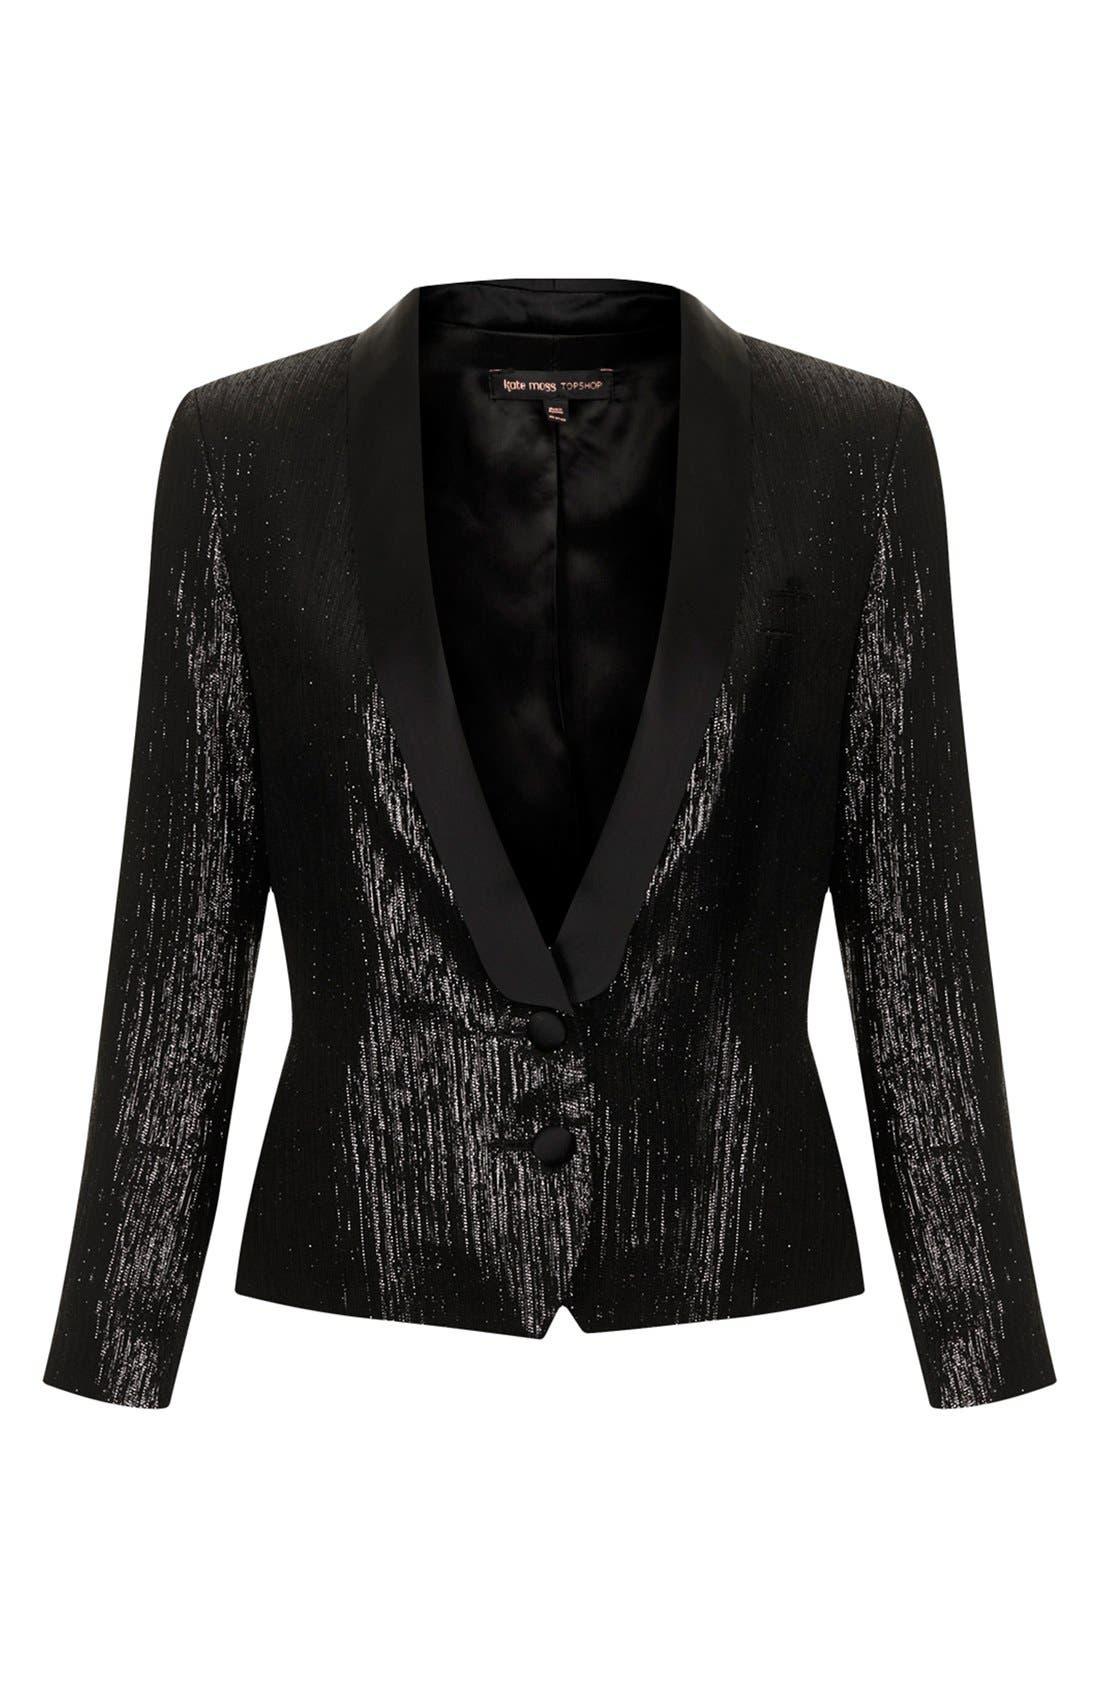 Alternate Image 2  - Kate Moss for Topshop Lamé Tuxedo Jacket